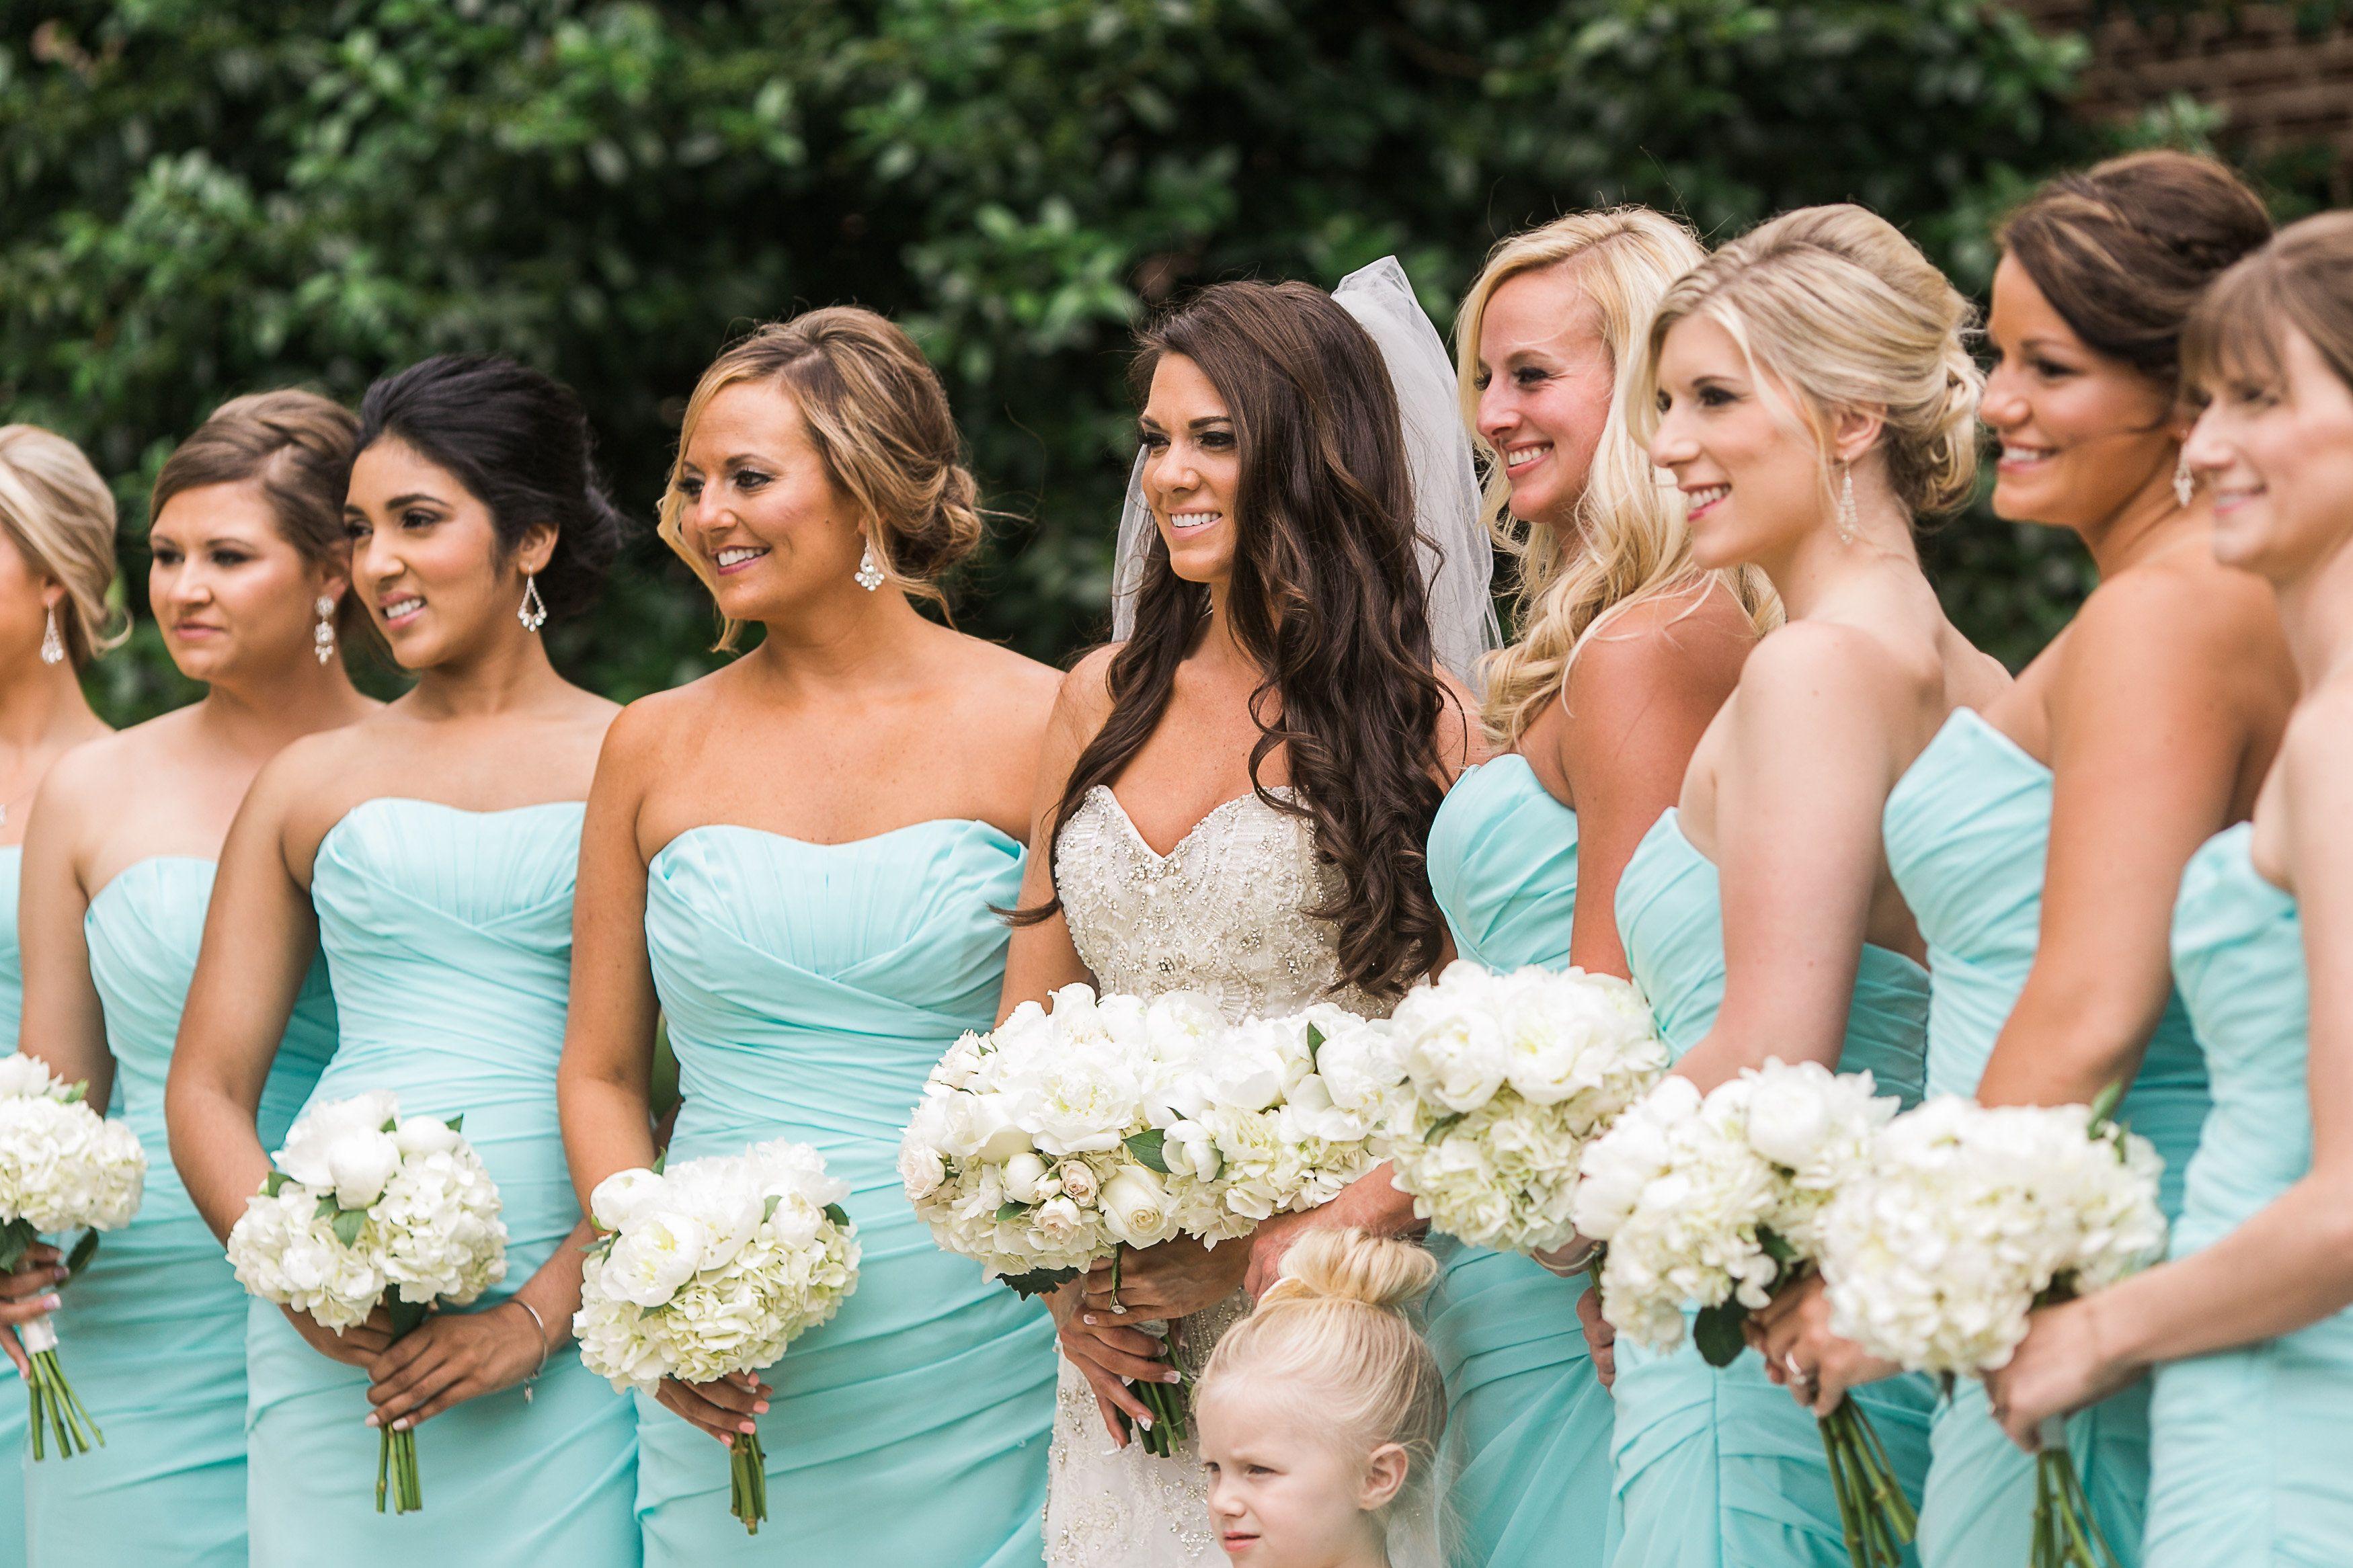 Tiffany blue wedding bridesmaids dress inspiring post by tiffany blue wedding bridesmaids dress inspiring post by bridestory everyone should read ombrellifo Gallery